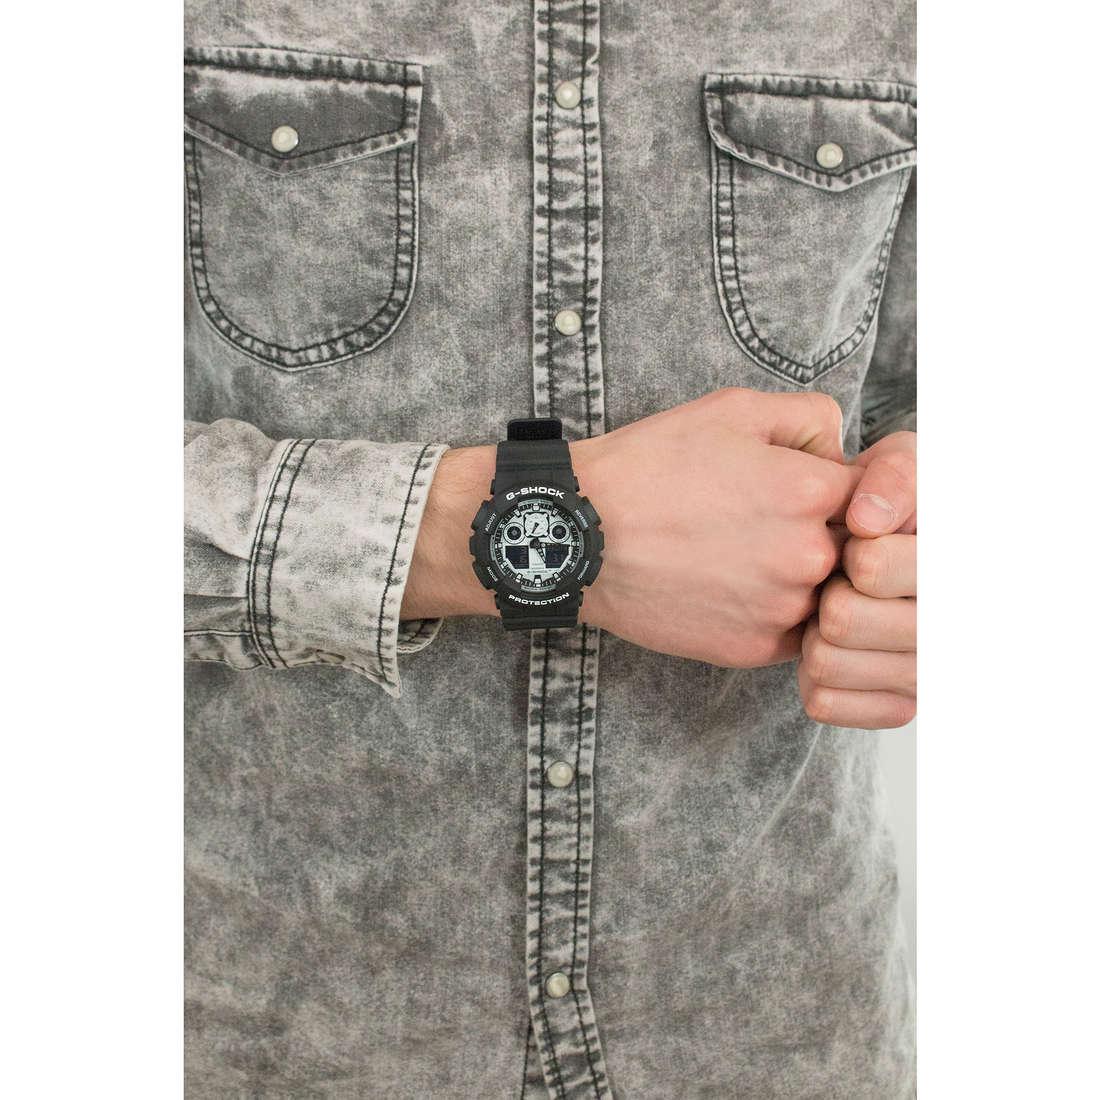 Casio digitali G-Shock uomo GA-100BW-1AER indosso